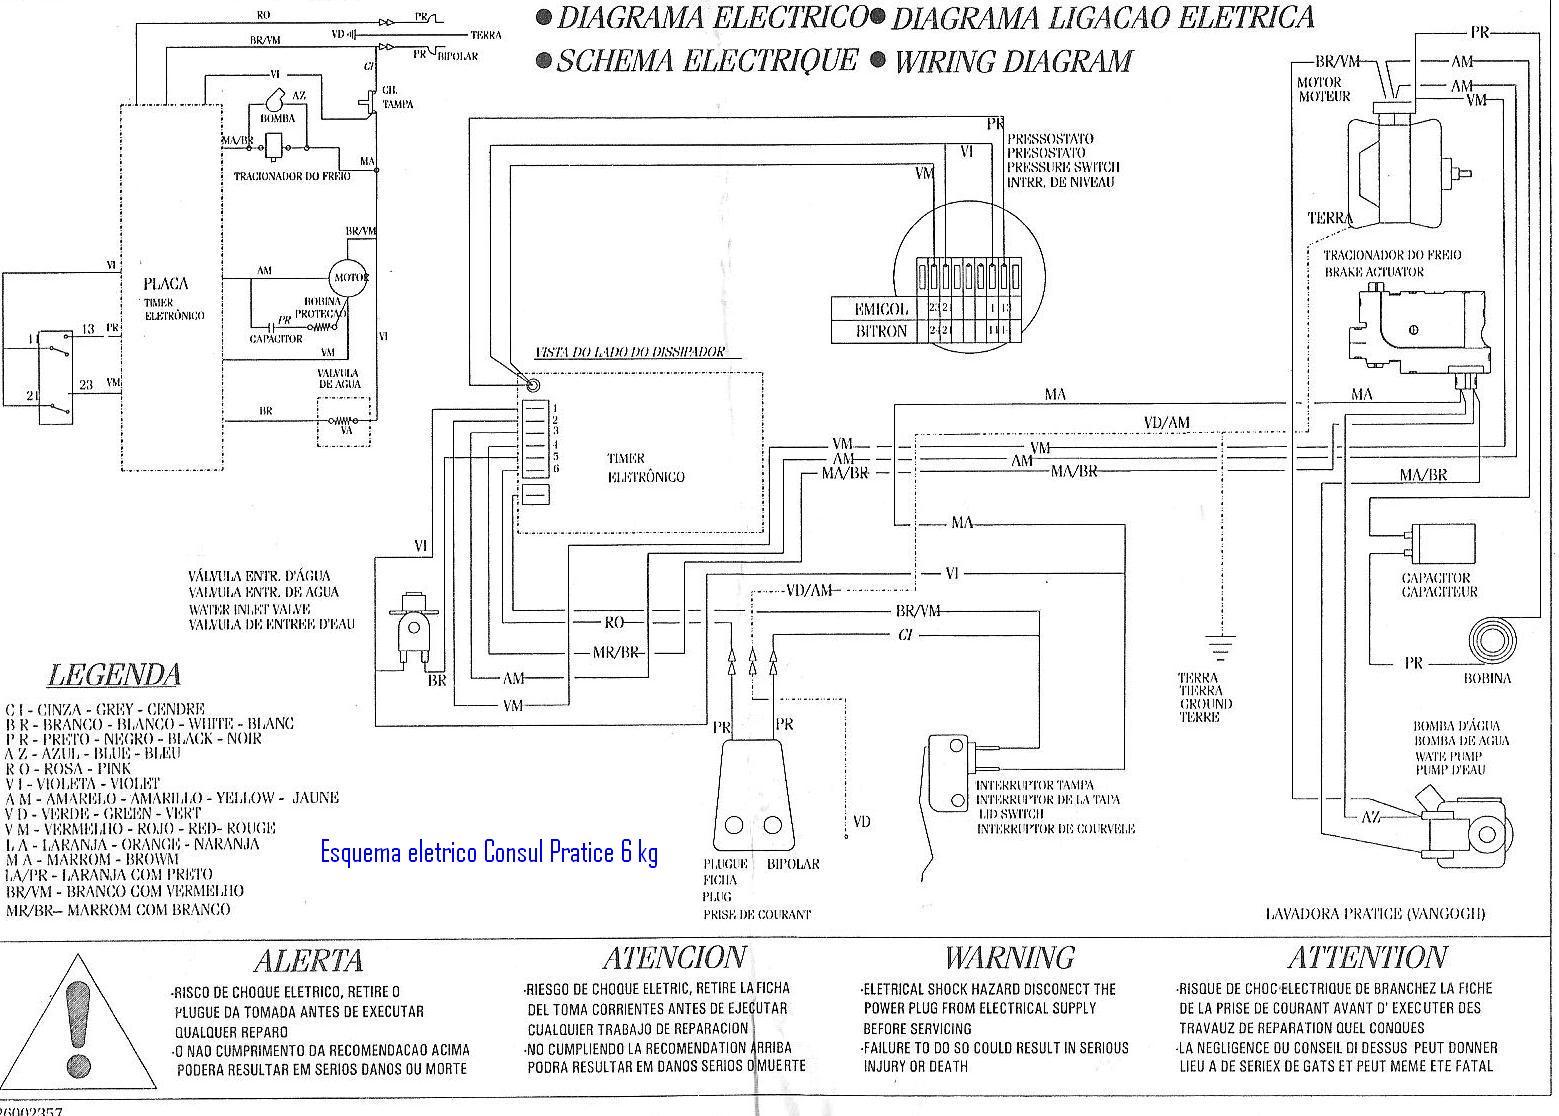 ge washer washing machine v belt wh1x2026 wh1x1249 wh01x2026 [ 1559 x 1116 Pixel ]